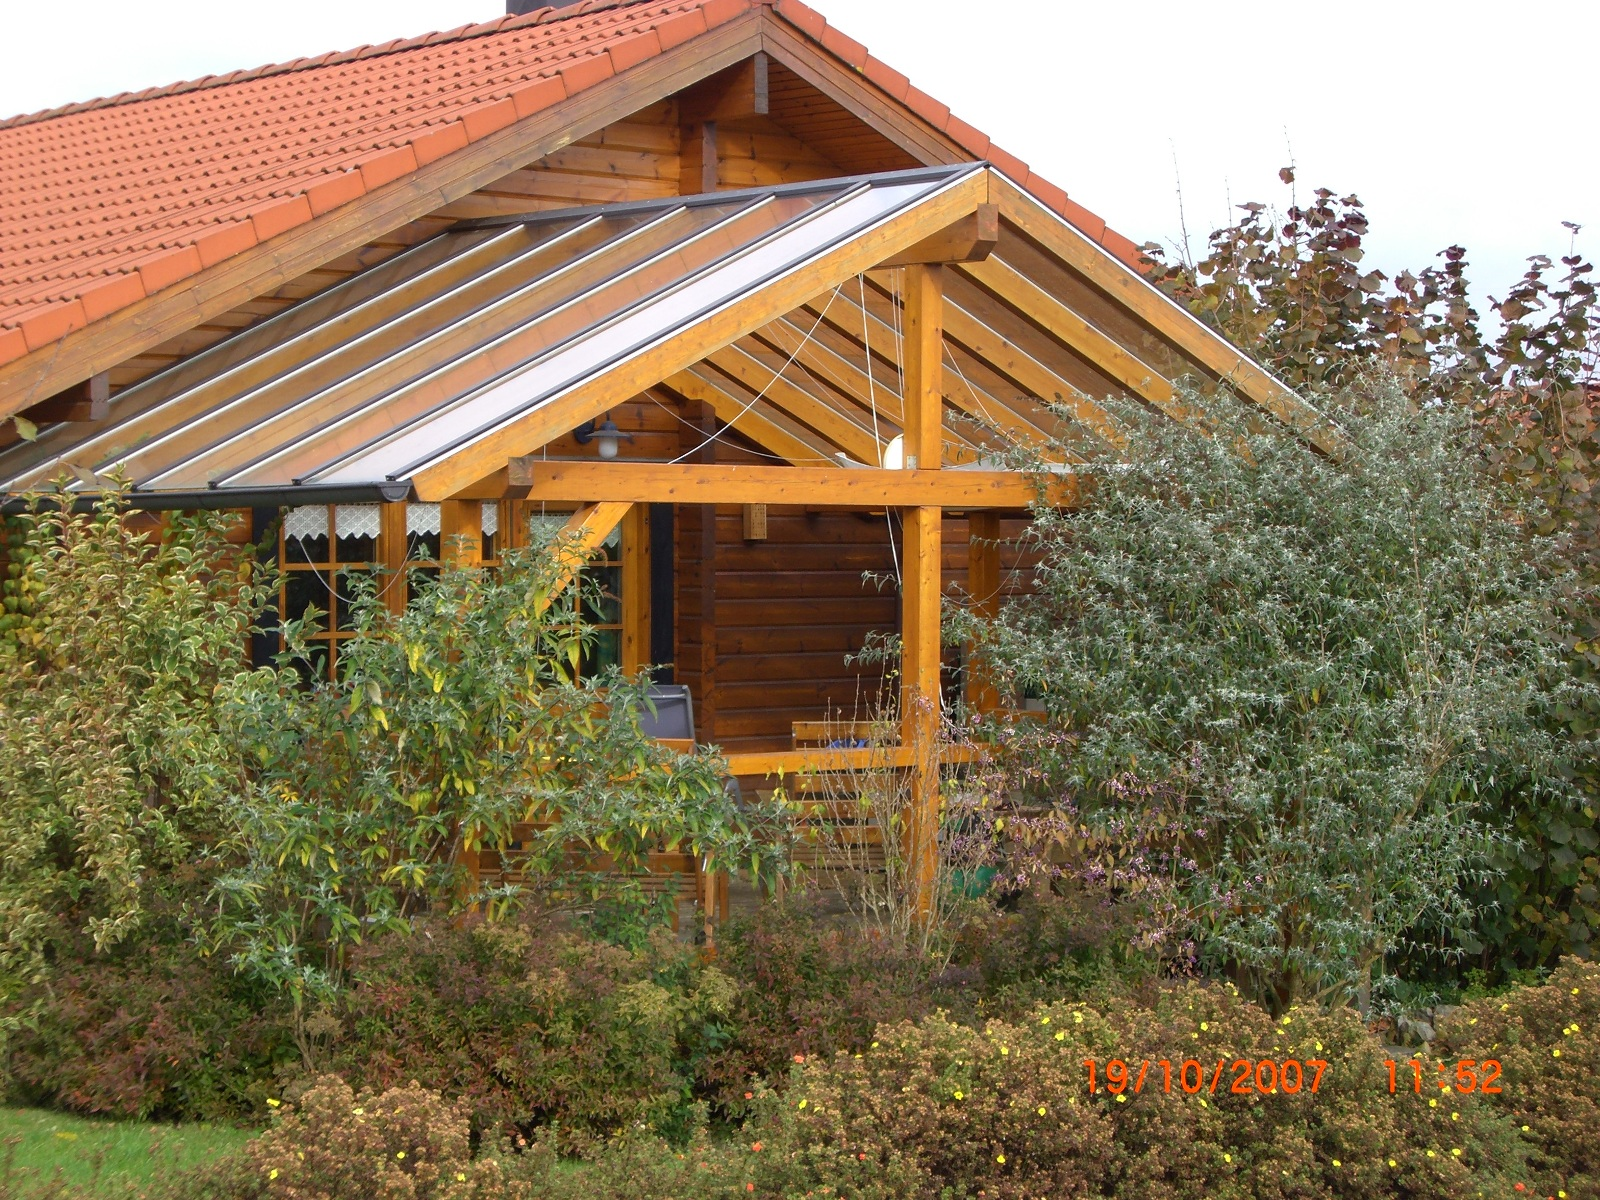 terrasse balkon carport zimmerei hombach. Black Bedroom Furniture Sets. Home Design Ideas